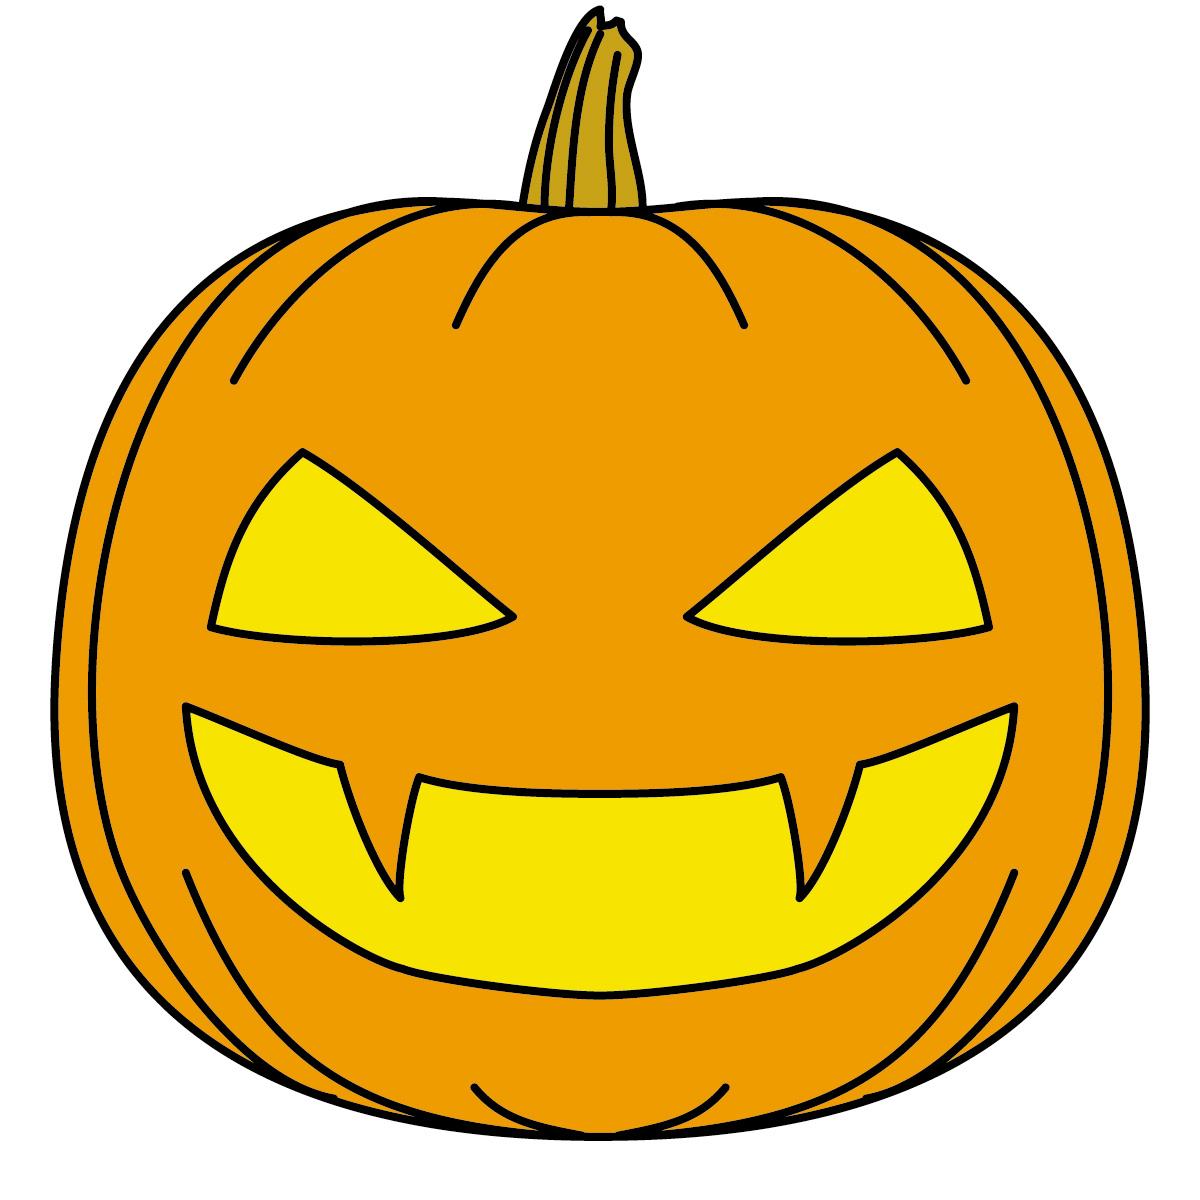 Cute Halloween Pumpkin Clipart   Free download on ClipArtMag